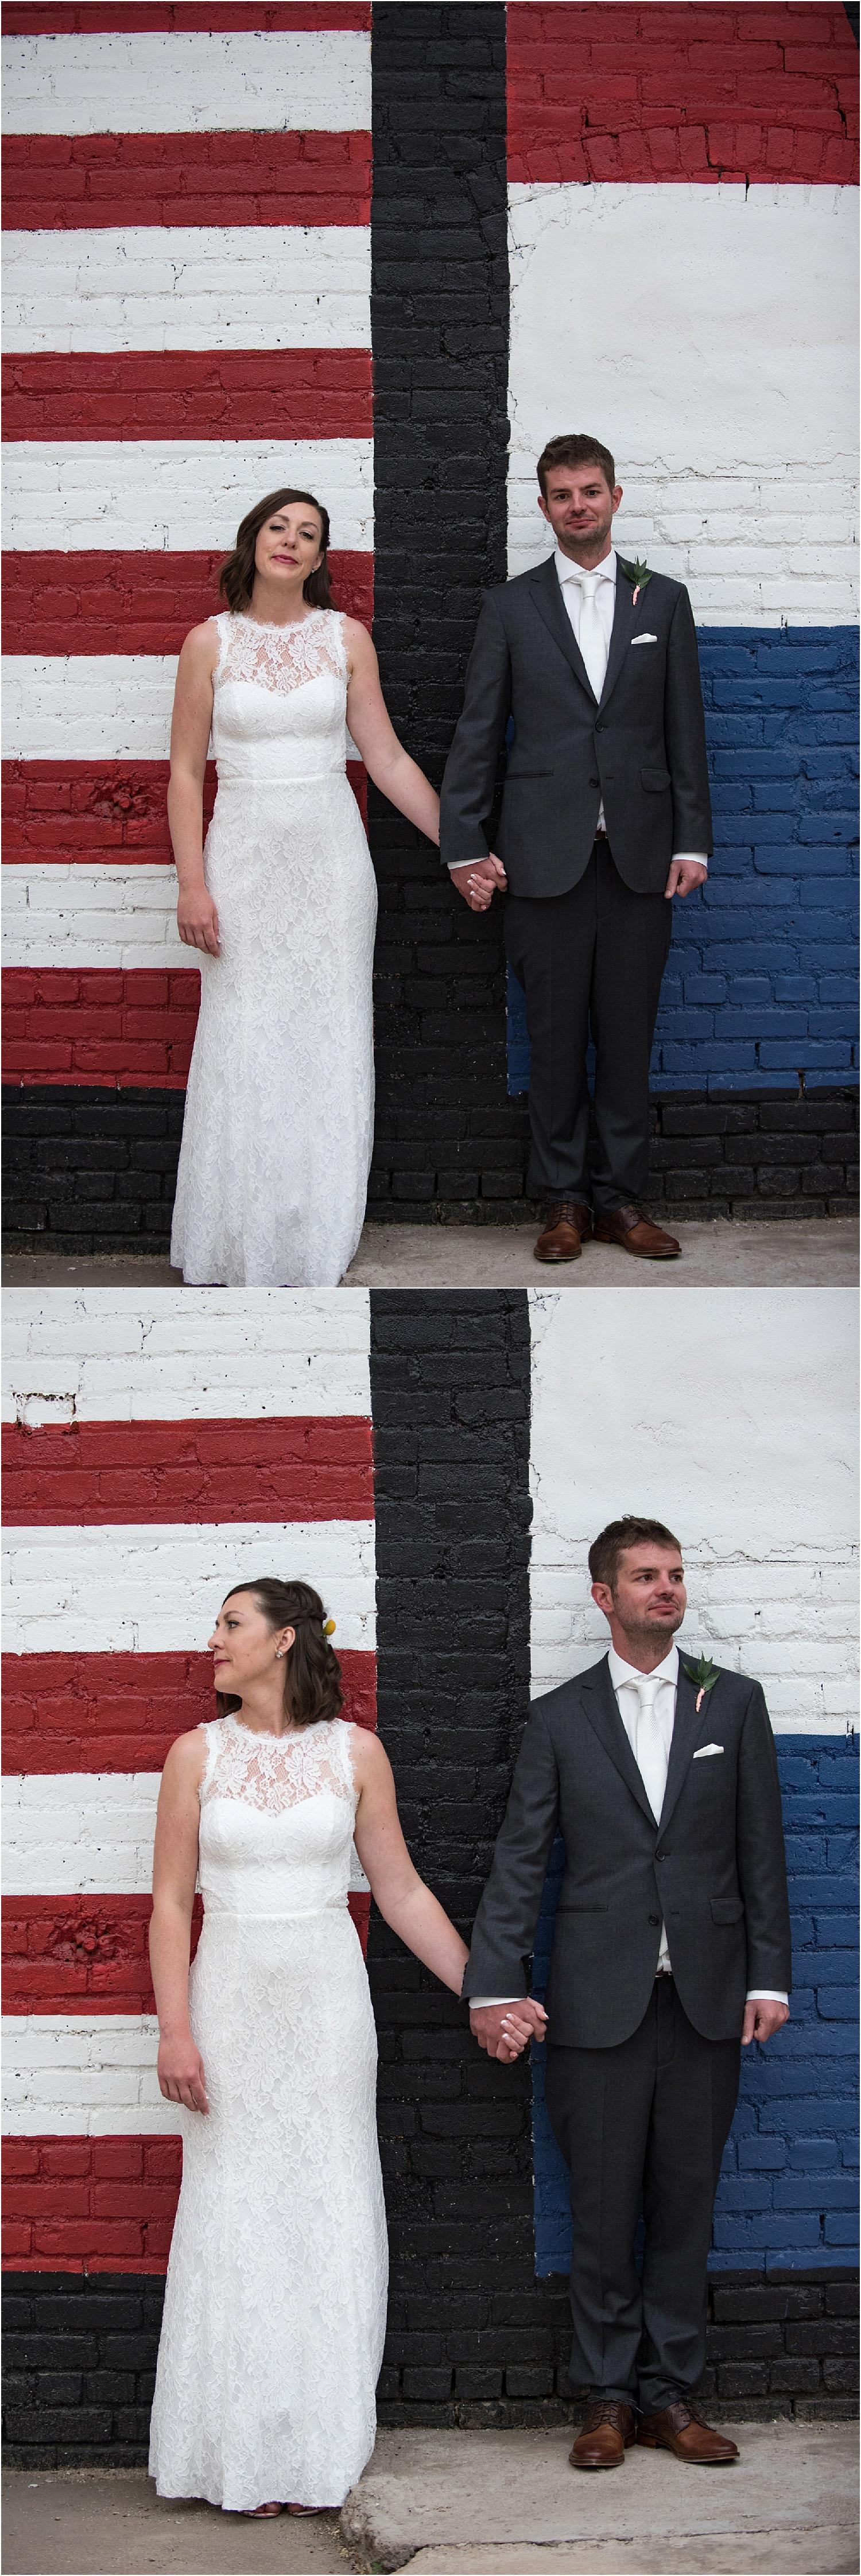 Denver_Wedding_Photography_Skylight_Urban_Venue_Modern_Bride_046.jpg